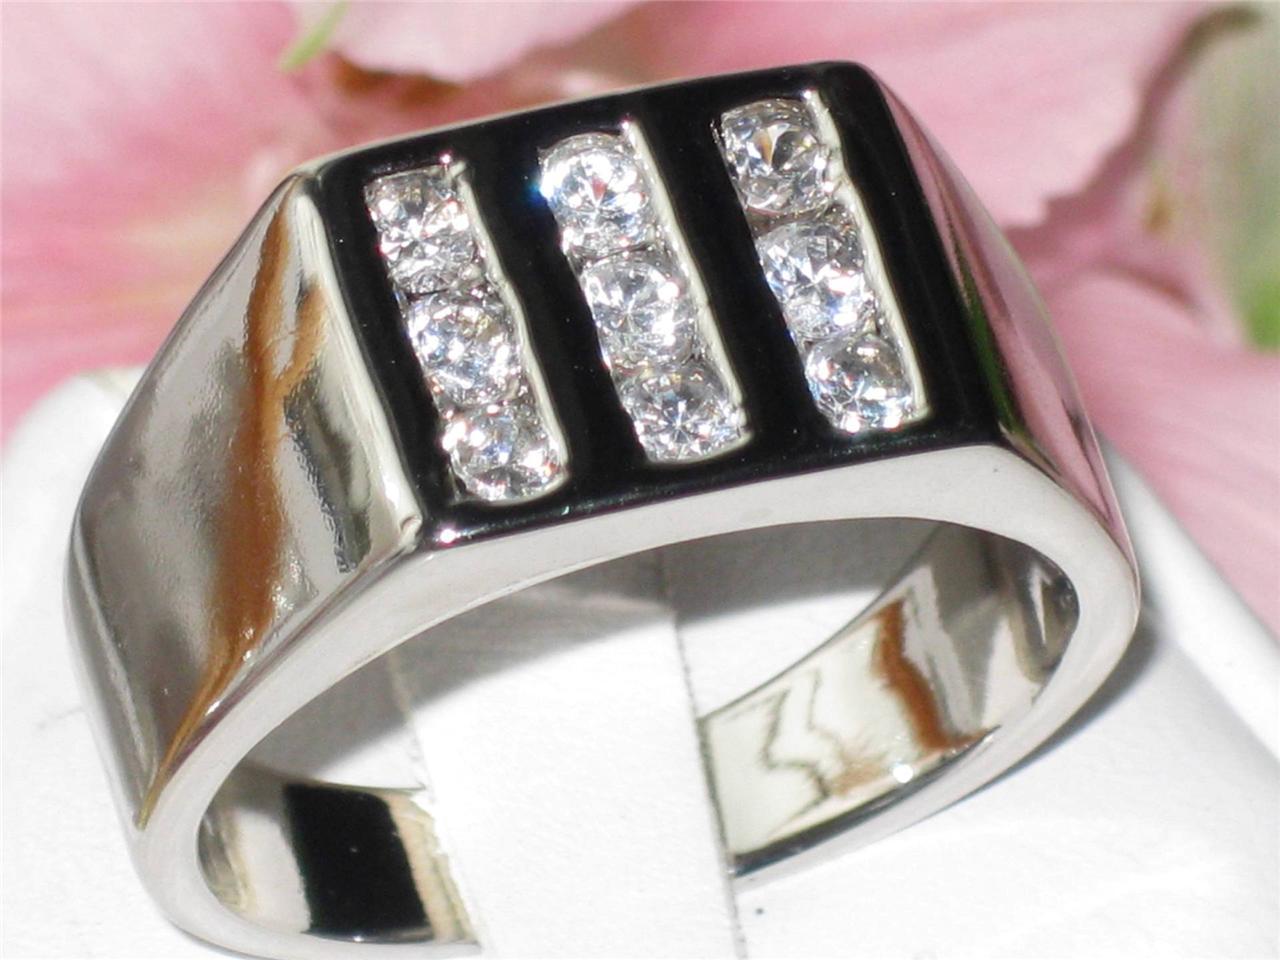 MENS-DESIGNER-MANS-RING-9-STONE-PAVE-SET-SIMULATED-DIAMOND-RING-M103